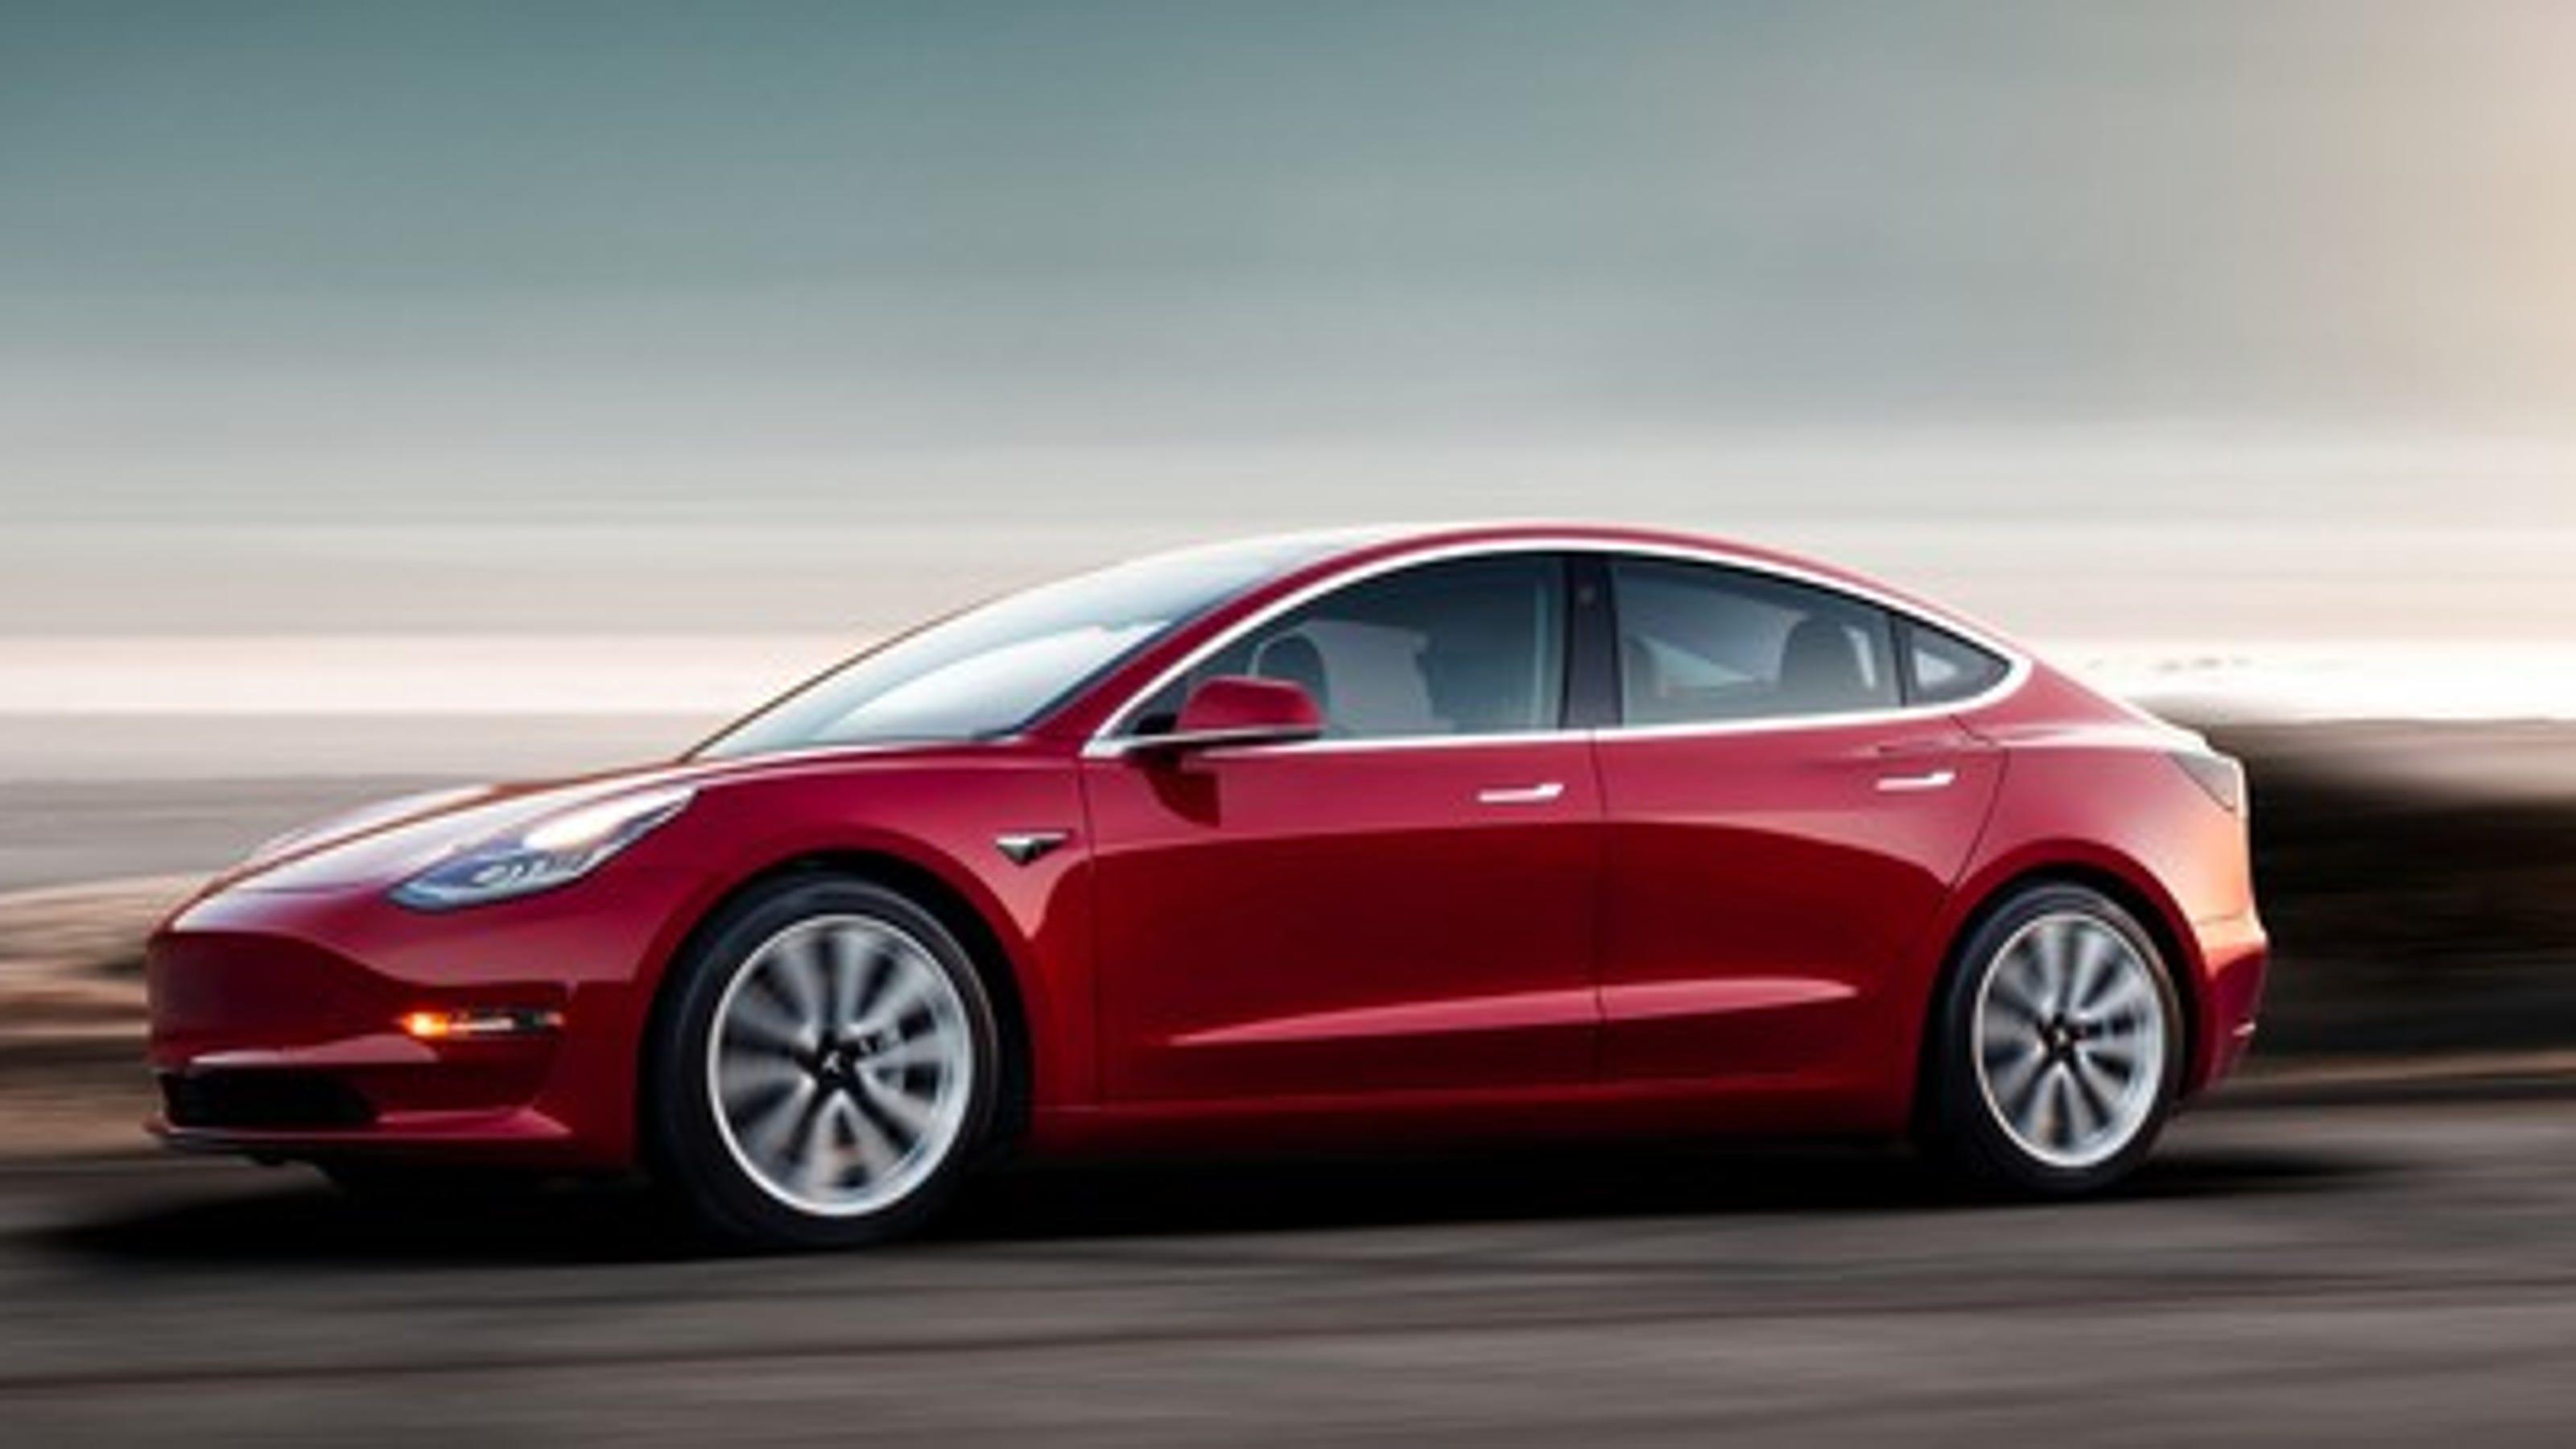 Tesla Electric Car Price Cut Model 3 Model S Model X Get Discounts